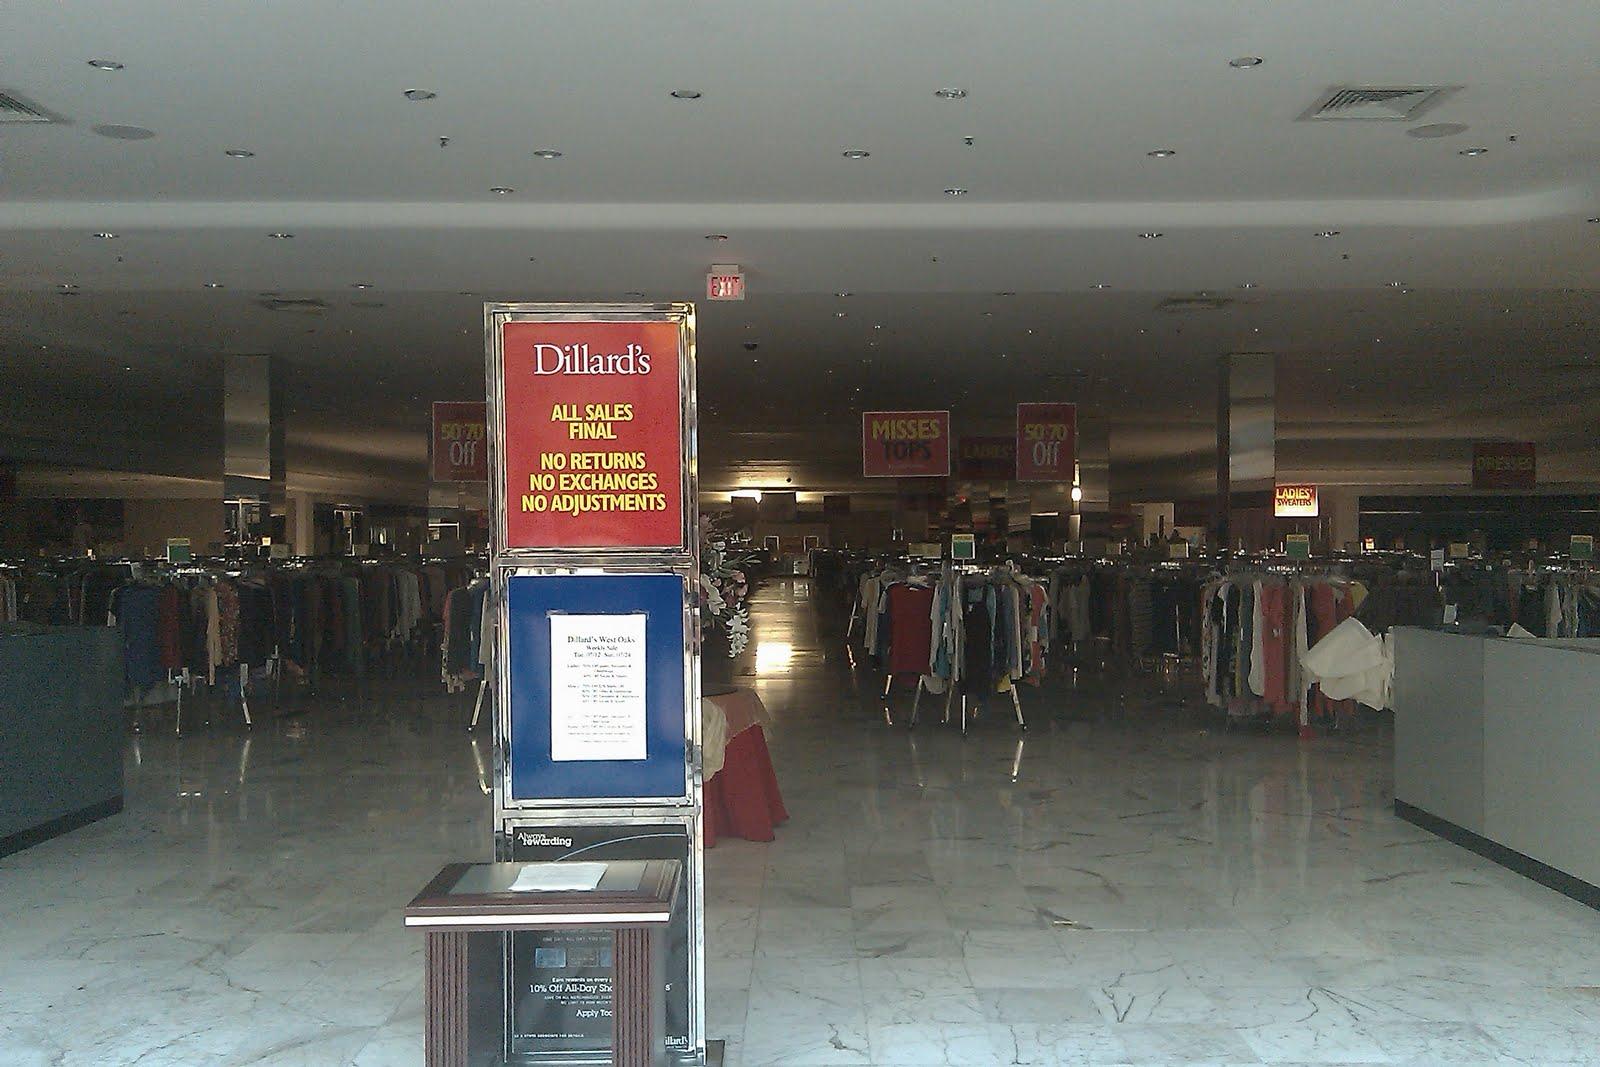 Dillardu0027s Clearance Center After Closing On A Sunday Evening.